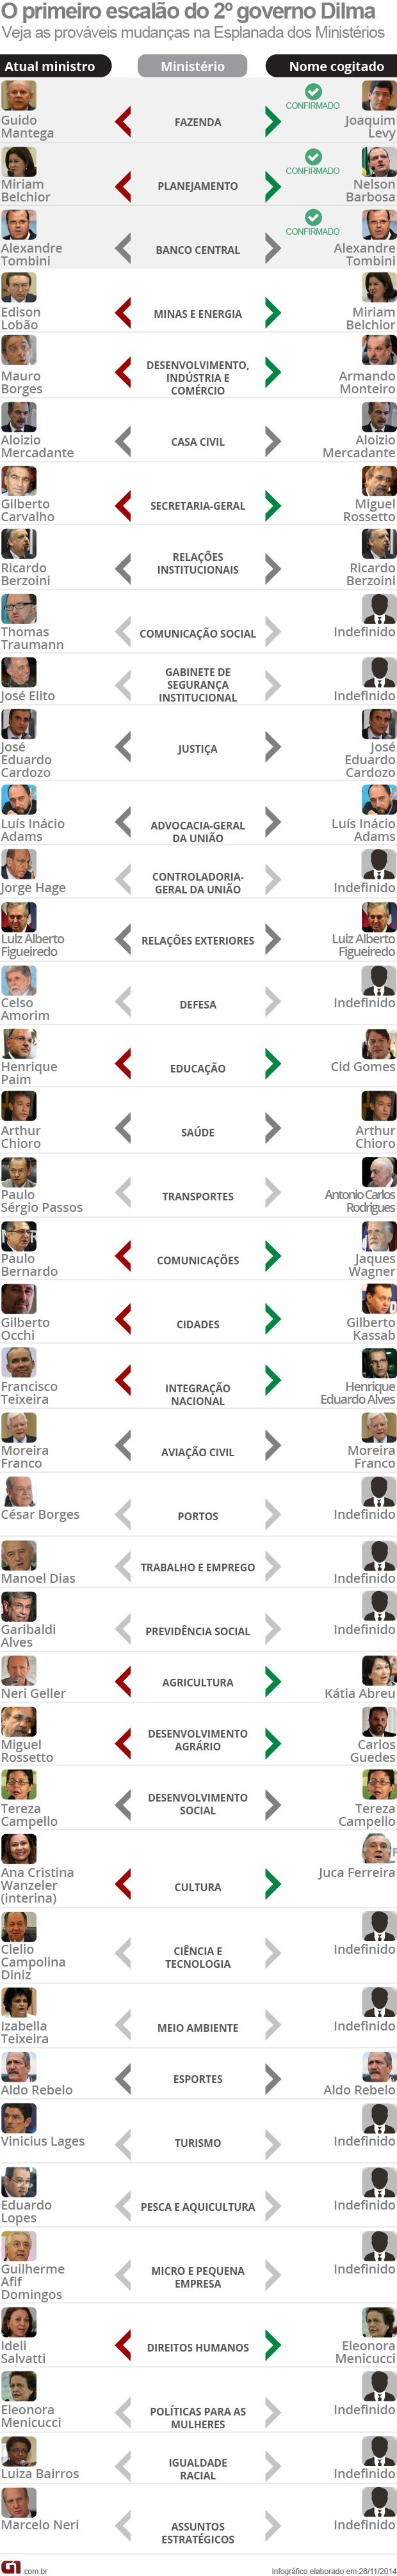 Equipe de ministros do segundo mandato da presidente Dilma Rousseff (Foto: Editoria de Arte / G1)